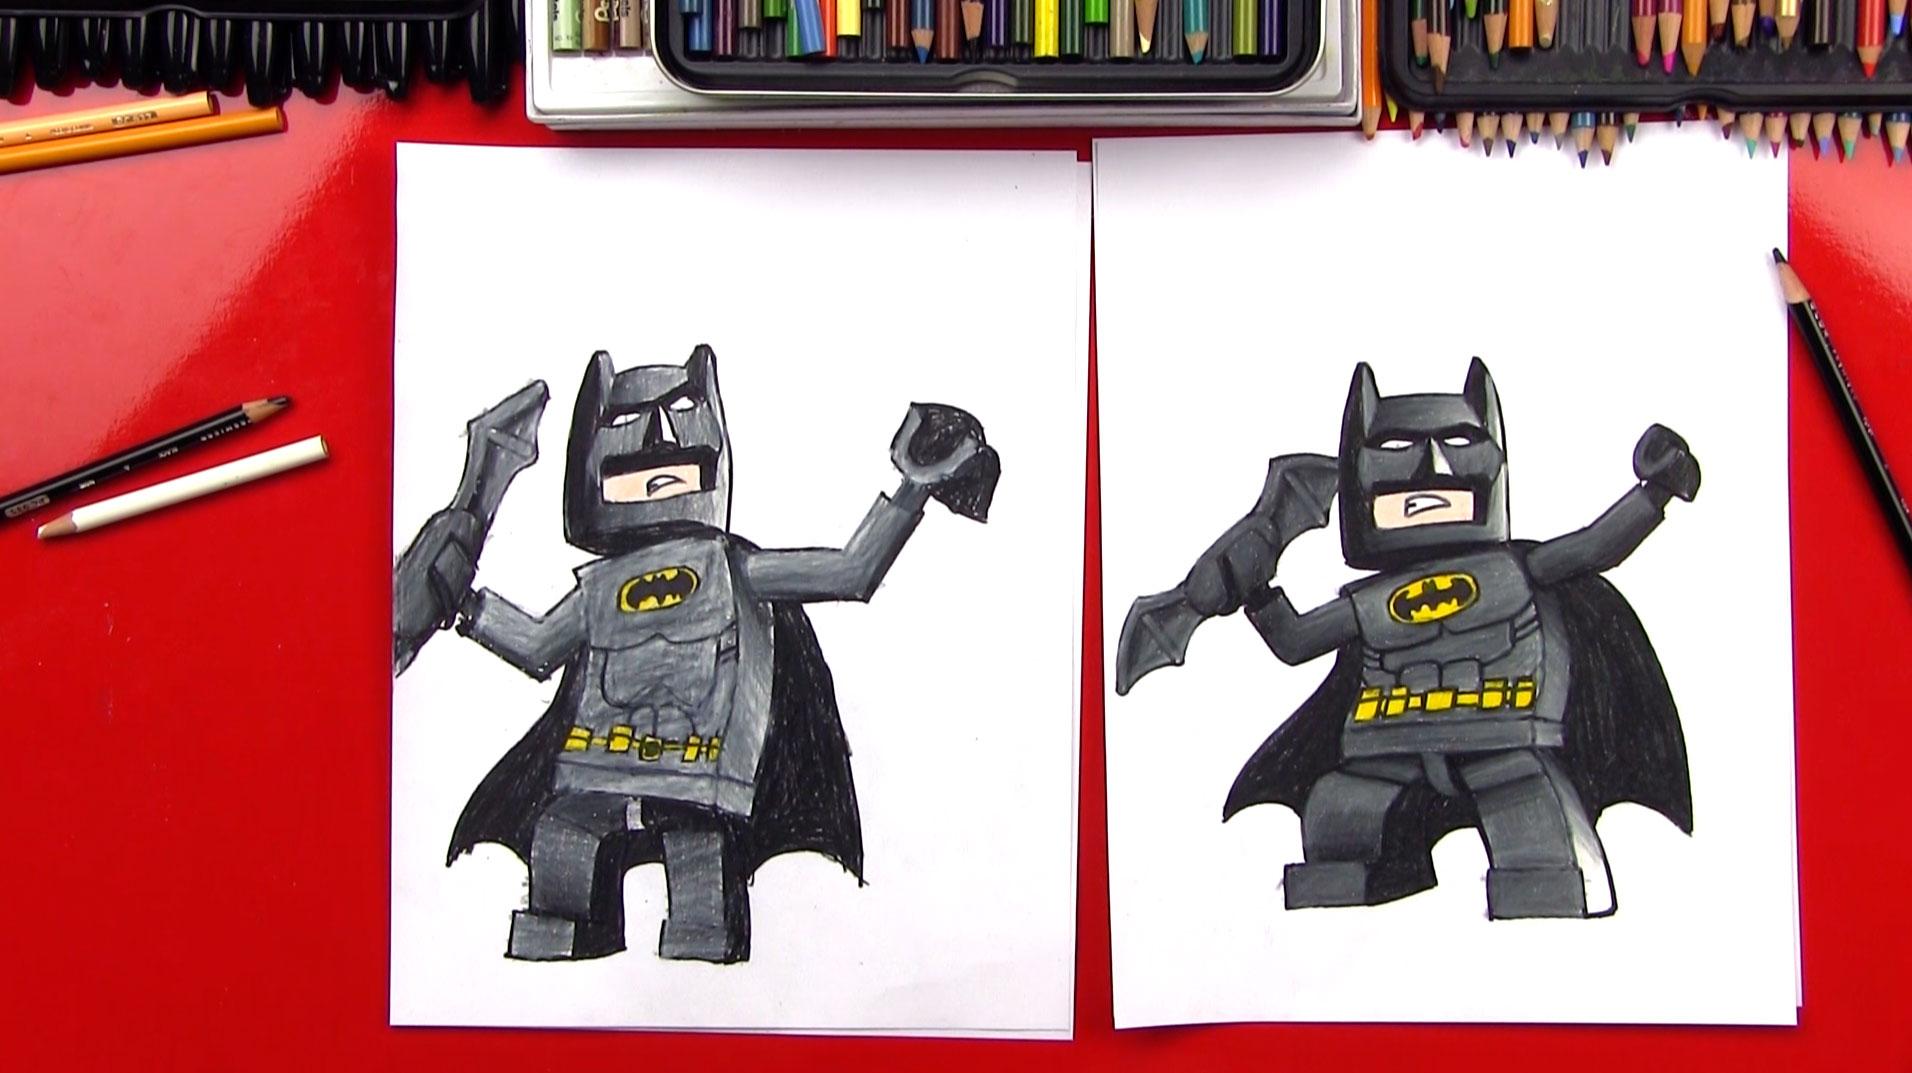 Cute Lego Stormtrooper Wallpaper How To Draw Lego Batman Sya Art For Kids Hub